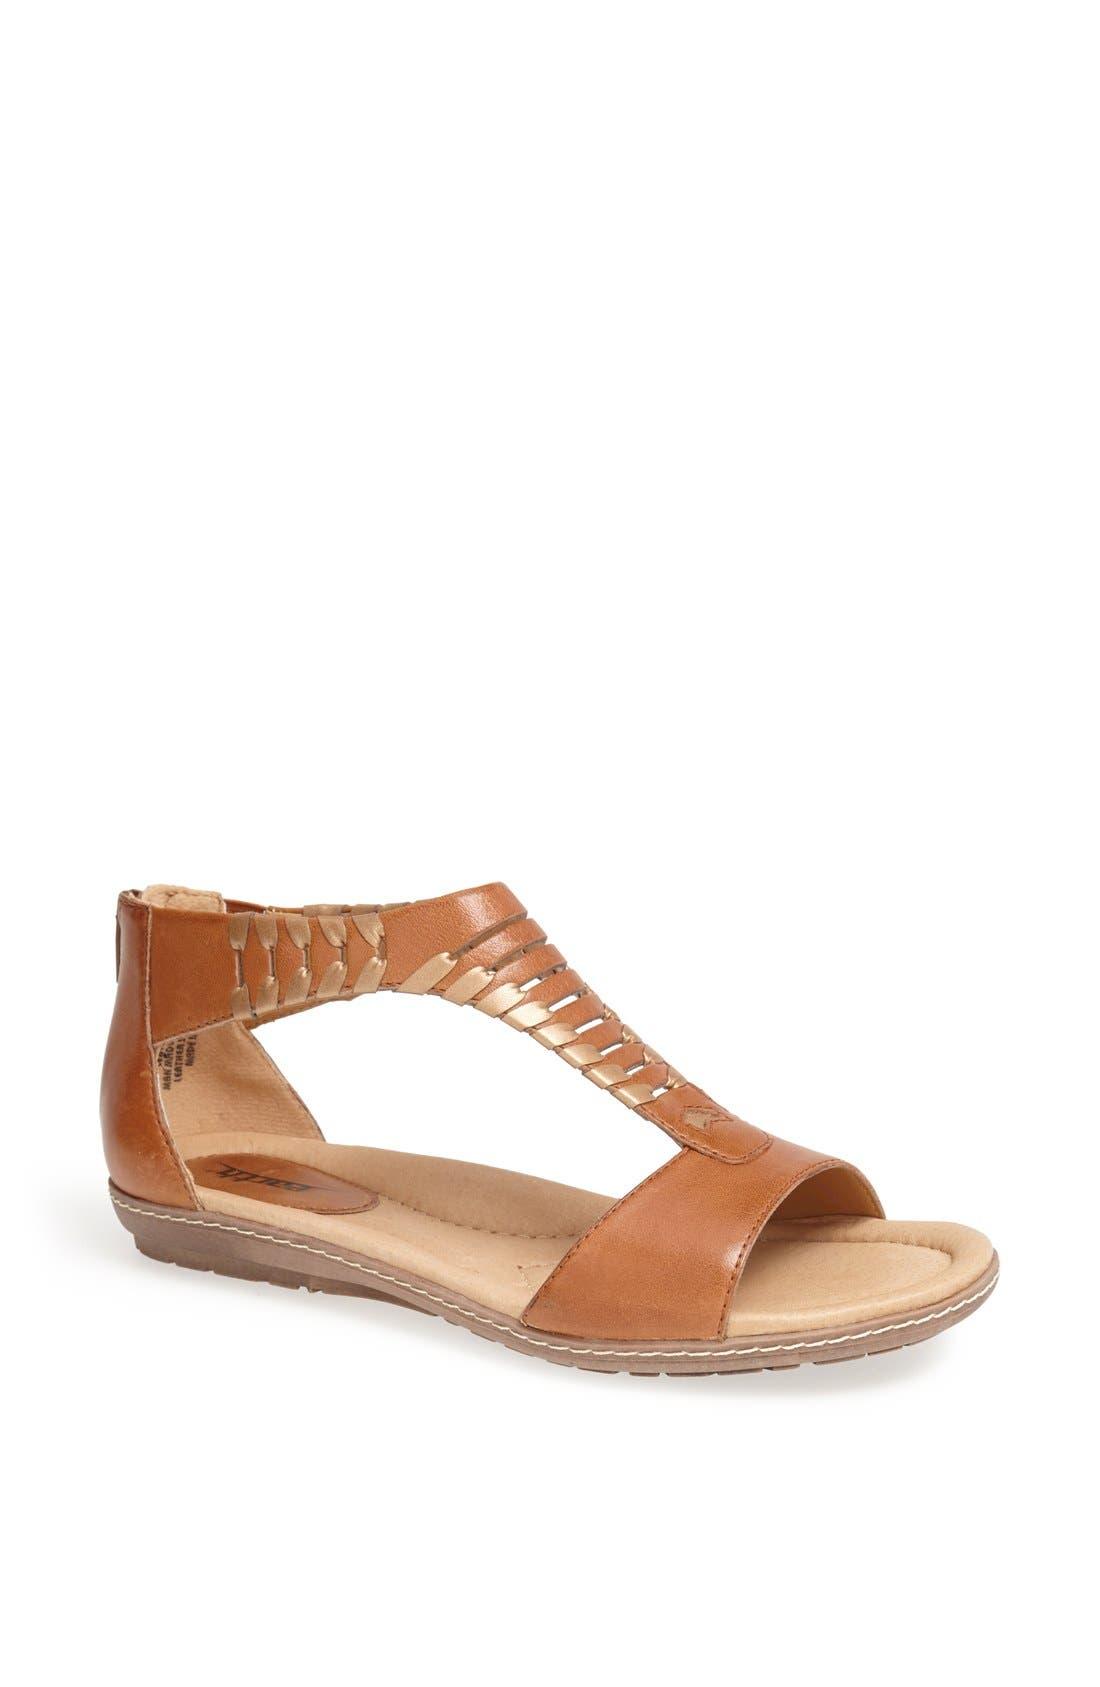 Alternate Image 1 Selected - Earth® 'Shell' Cutout Leather Sandal